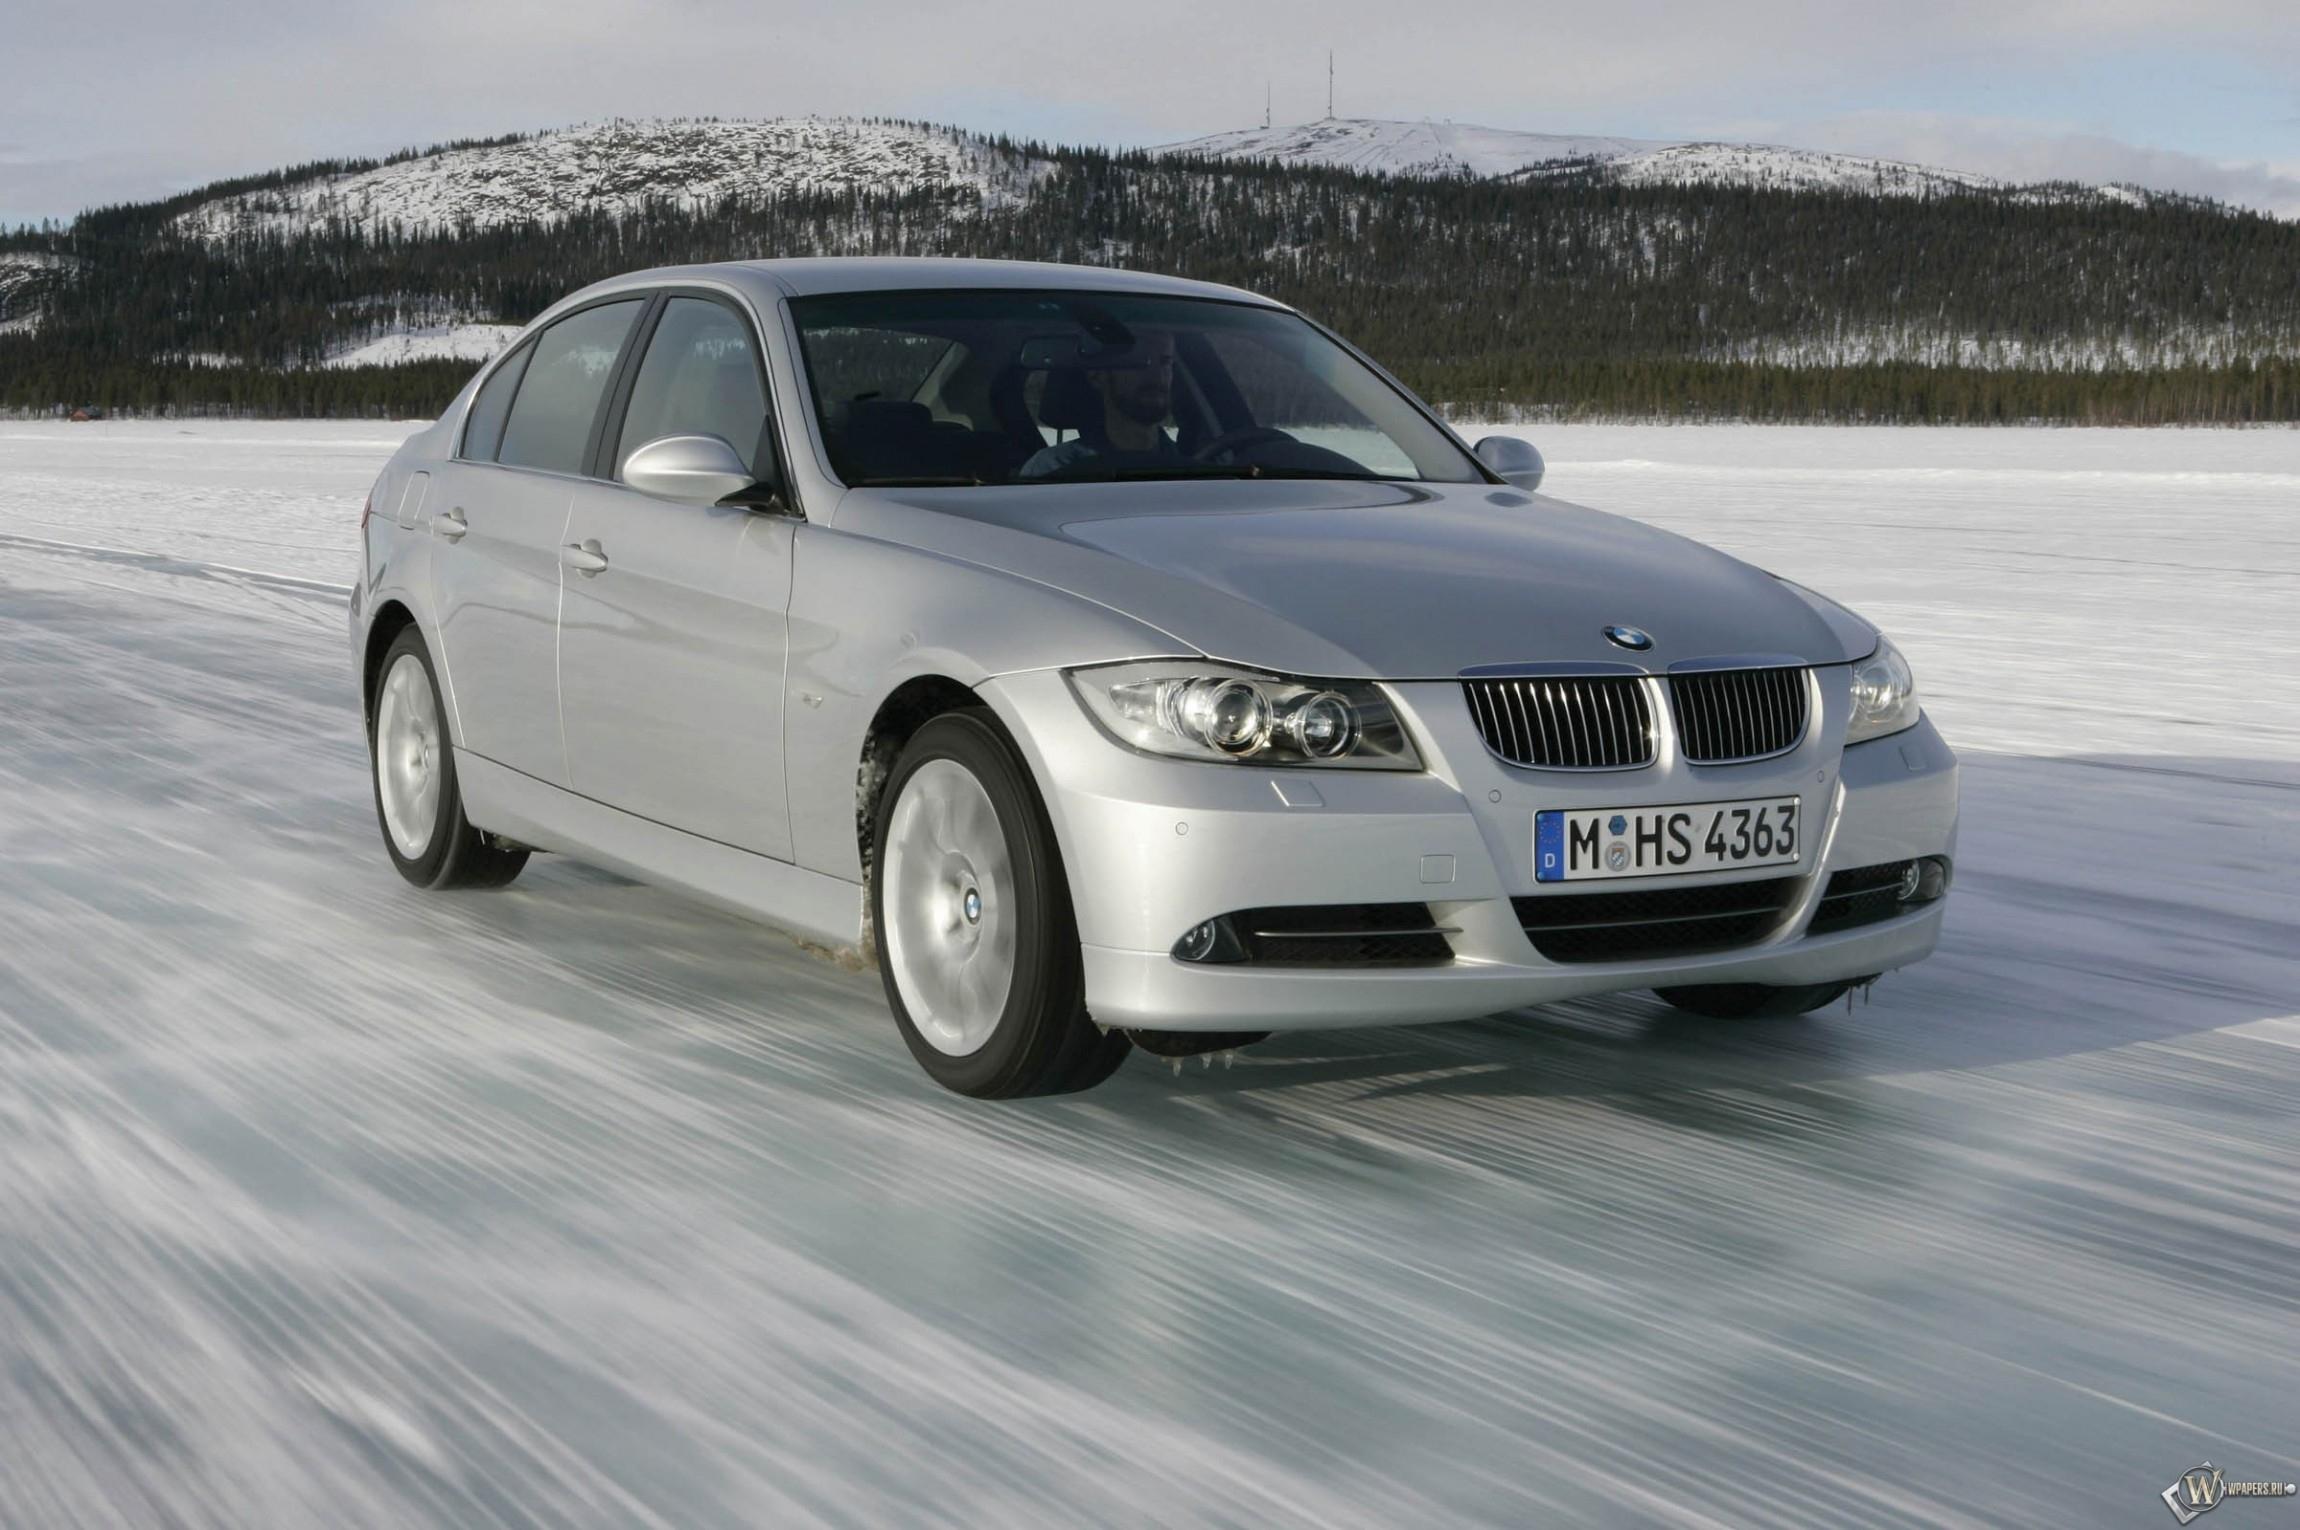 BMW 3 - Series (2006) 2300x1530